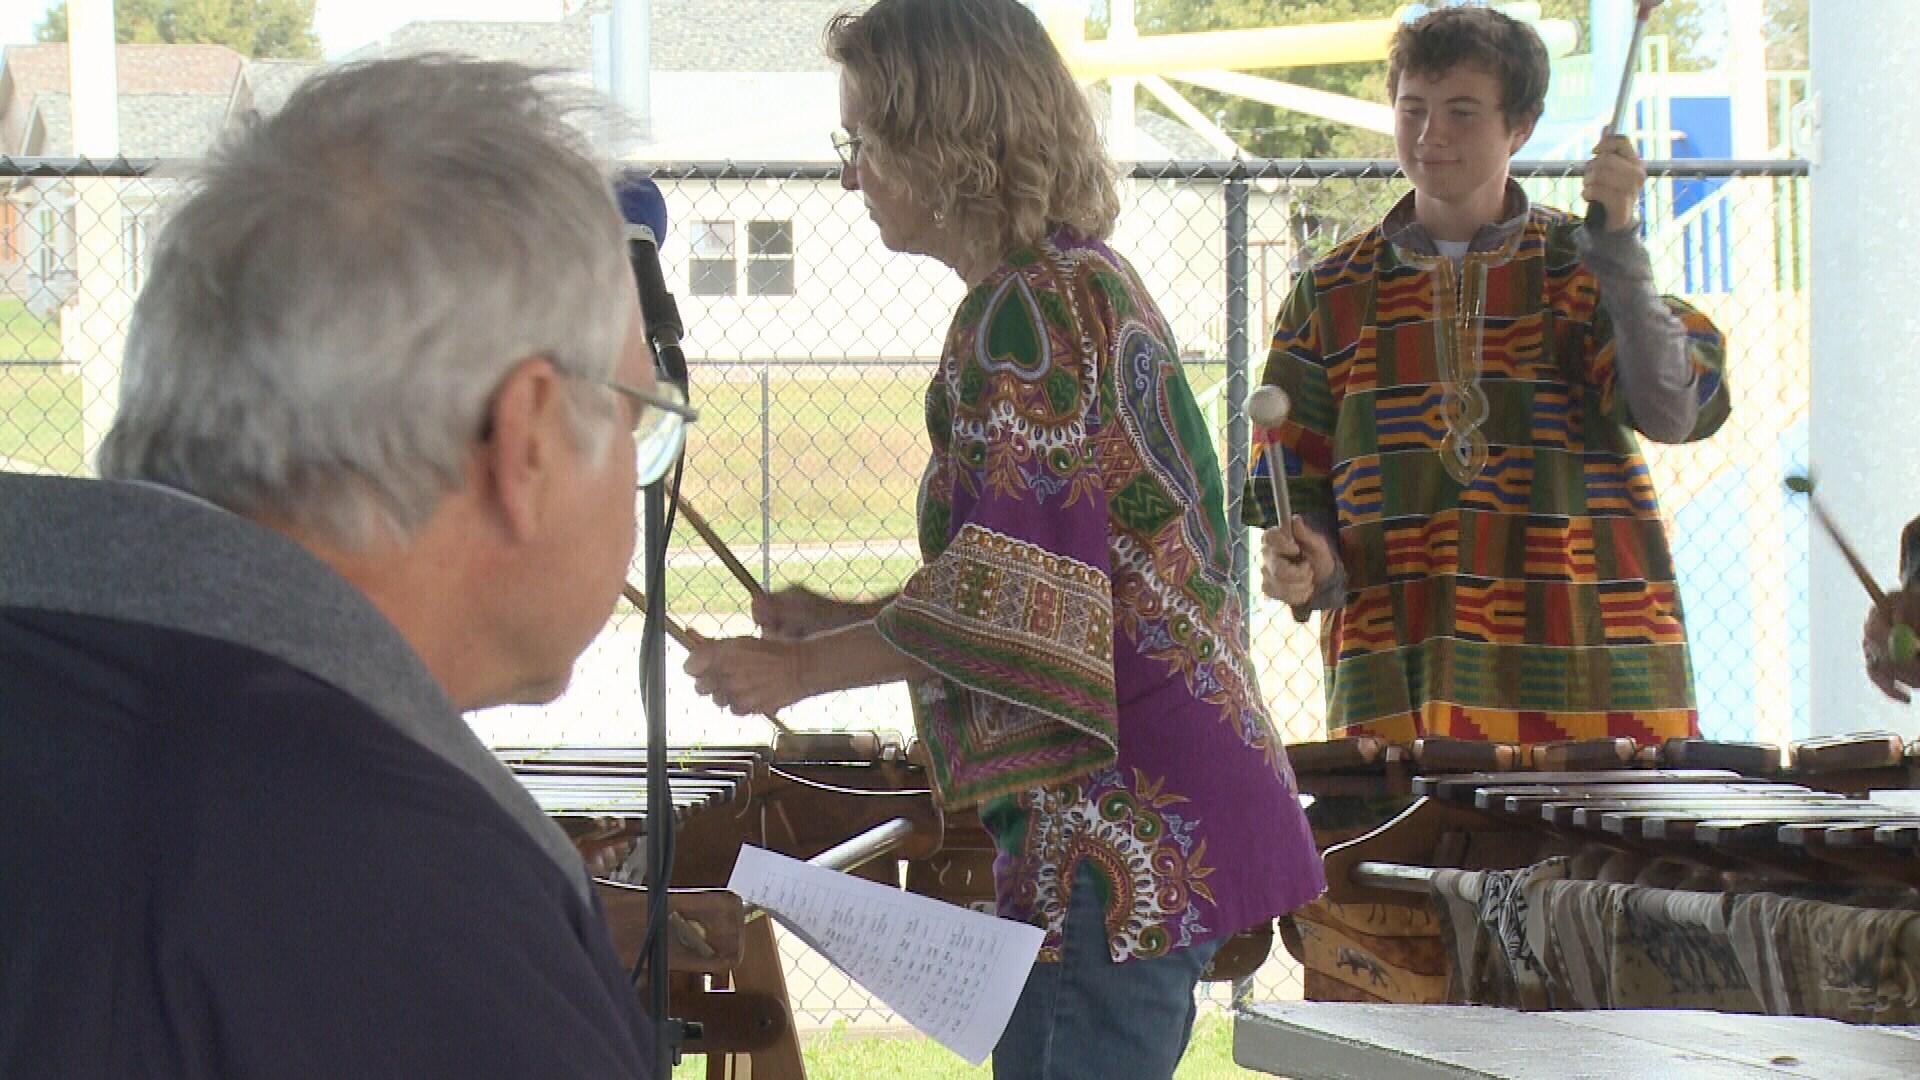 Attendees listen to Kufara, an African marimba band.